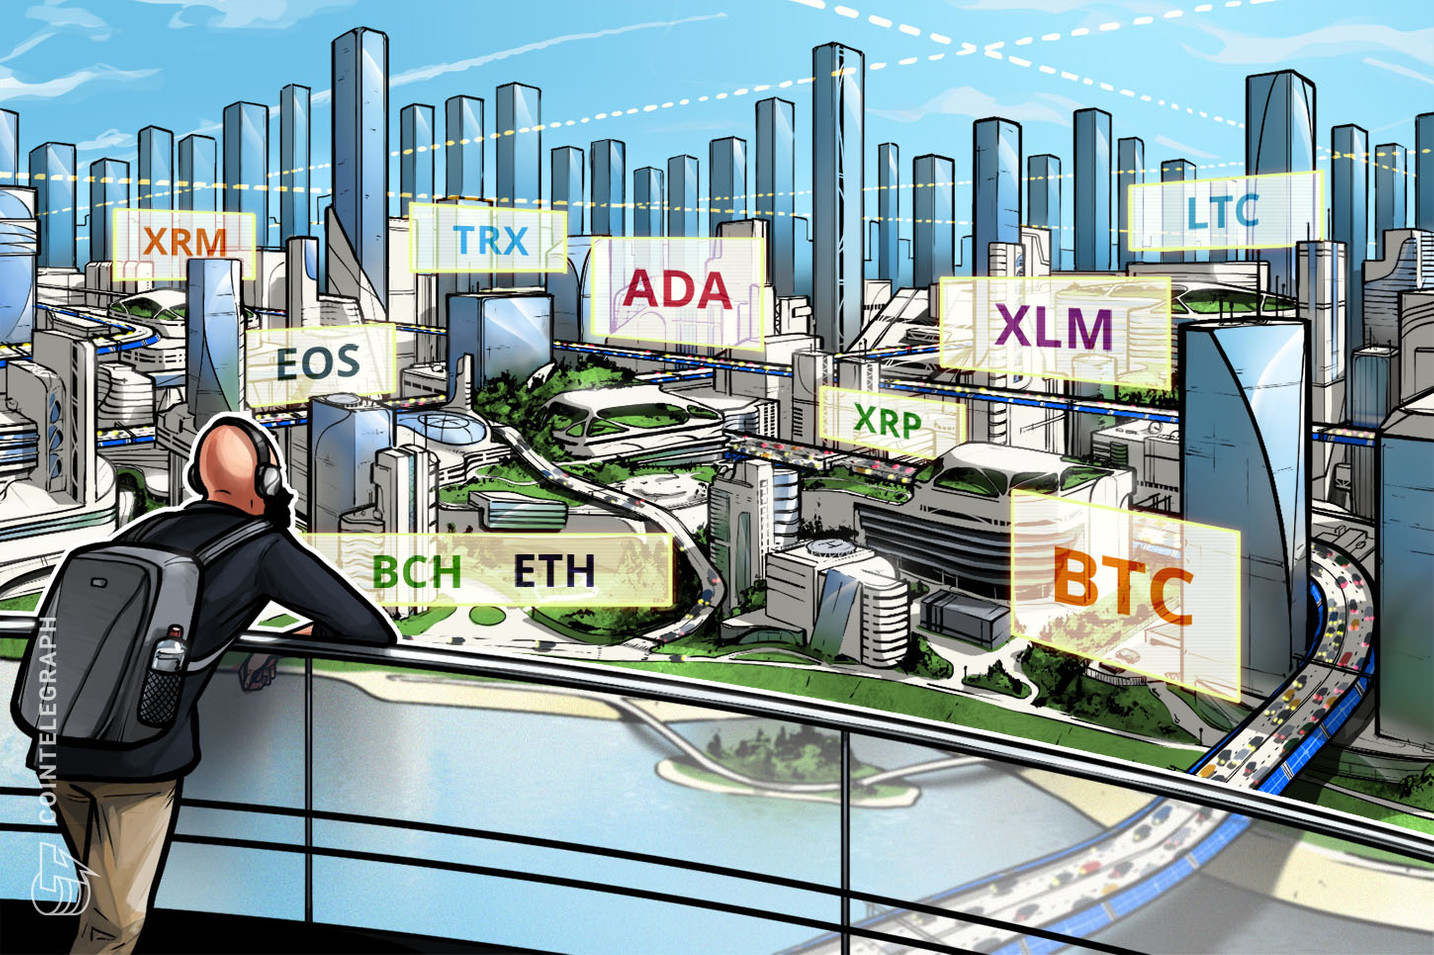 Bitcoin, Ethereum, Ripple, Bitcoin Cash, EOS, Stellar, Litecoin, Cardano, Monero, TRON: Price Analysis, October 24